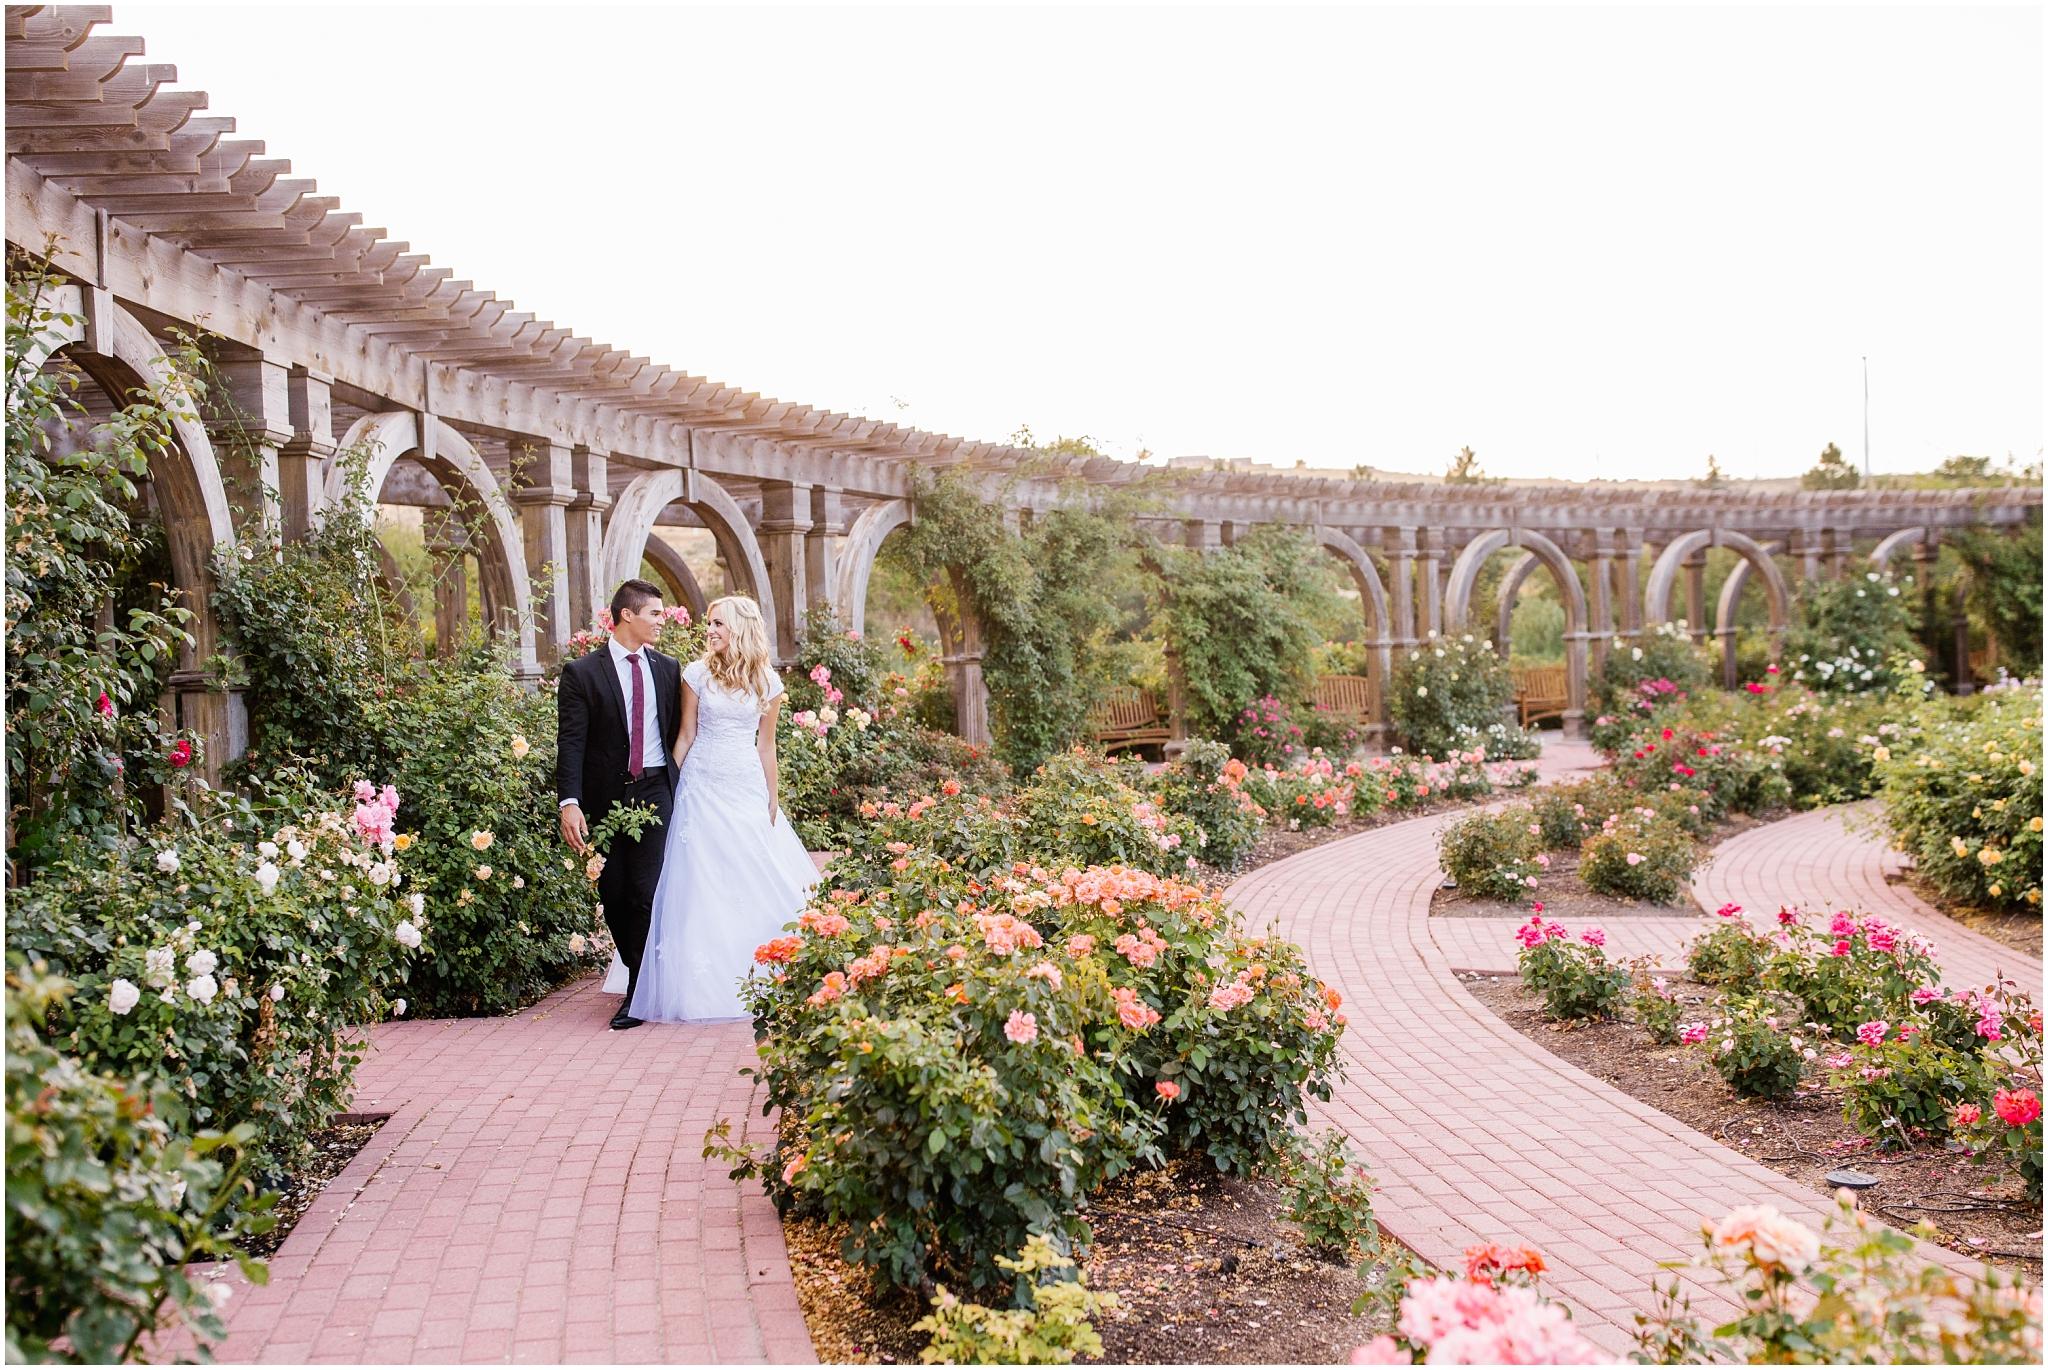 CHBridals-118_Lizzie-B-Imagery-Utah-Wedding-Photographer-Central-Utah-Park-City-Salt-Lake-City-Thanksgiving-Point-Bridals-Ashton-Gardens.jpg